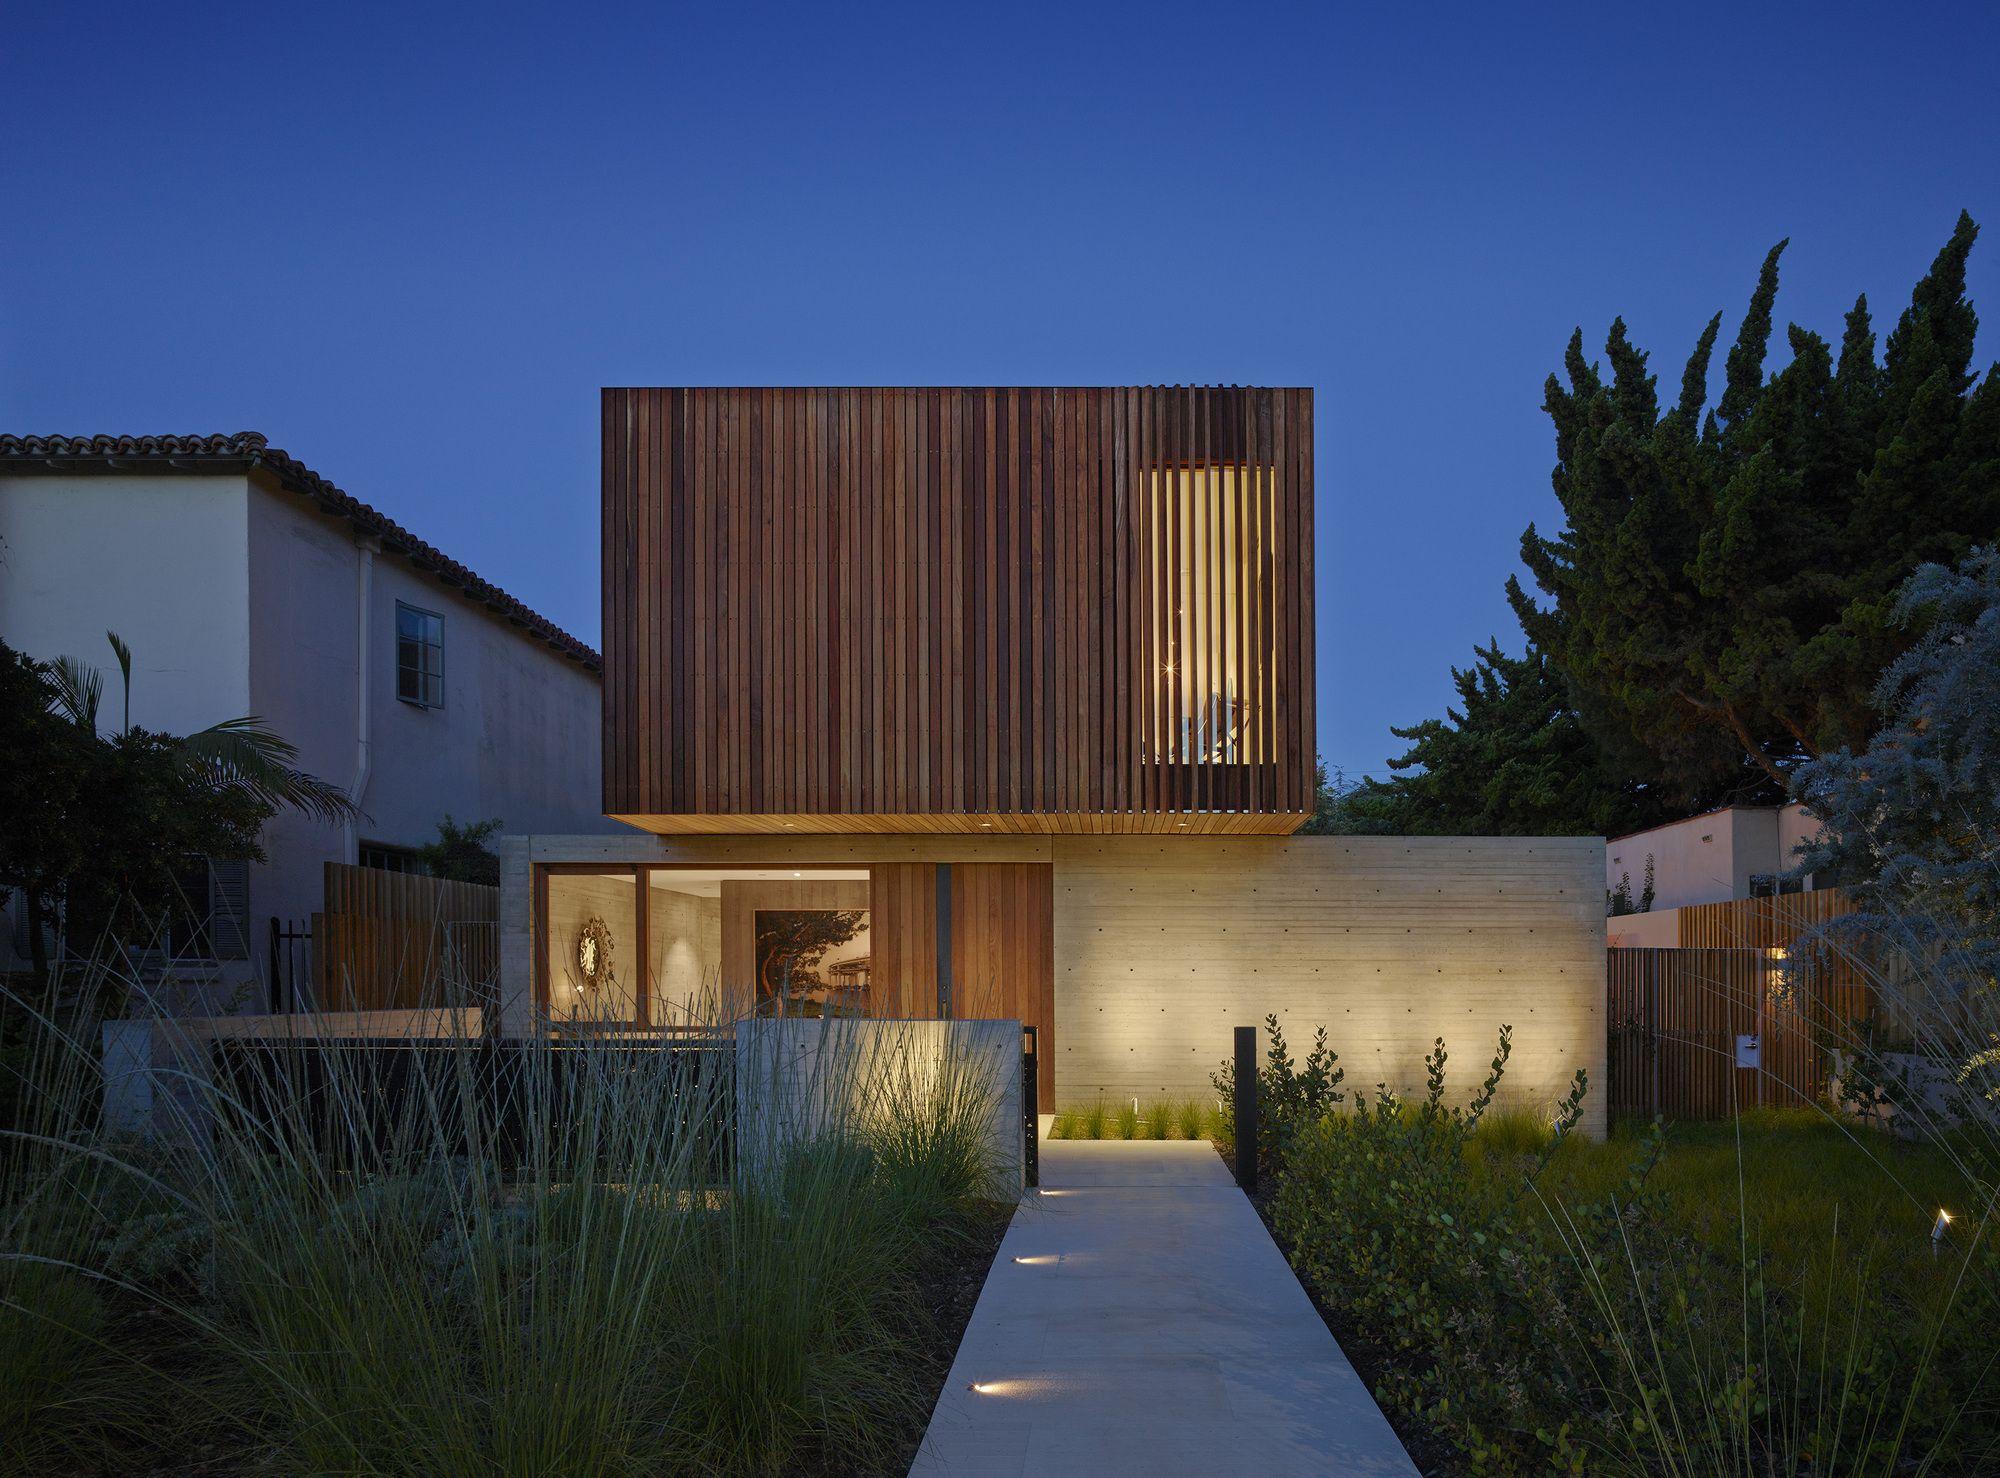 Taslimi Residence - Fleetwood Fernandez Architects